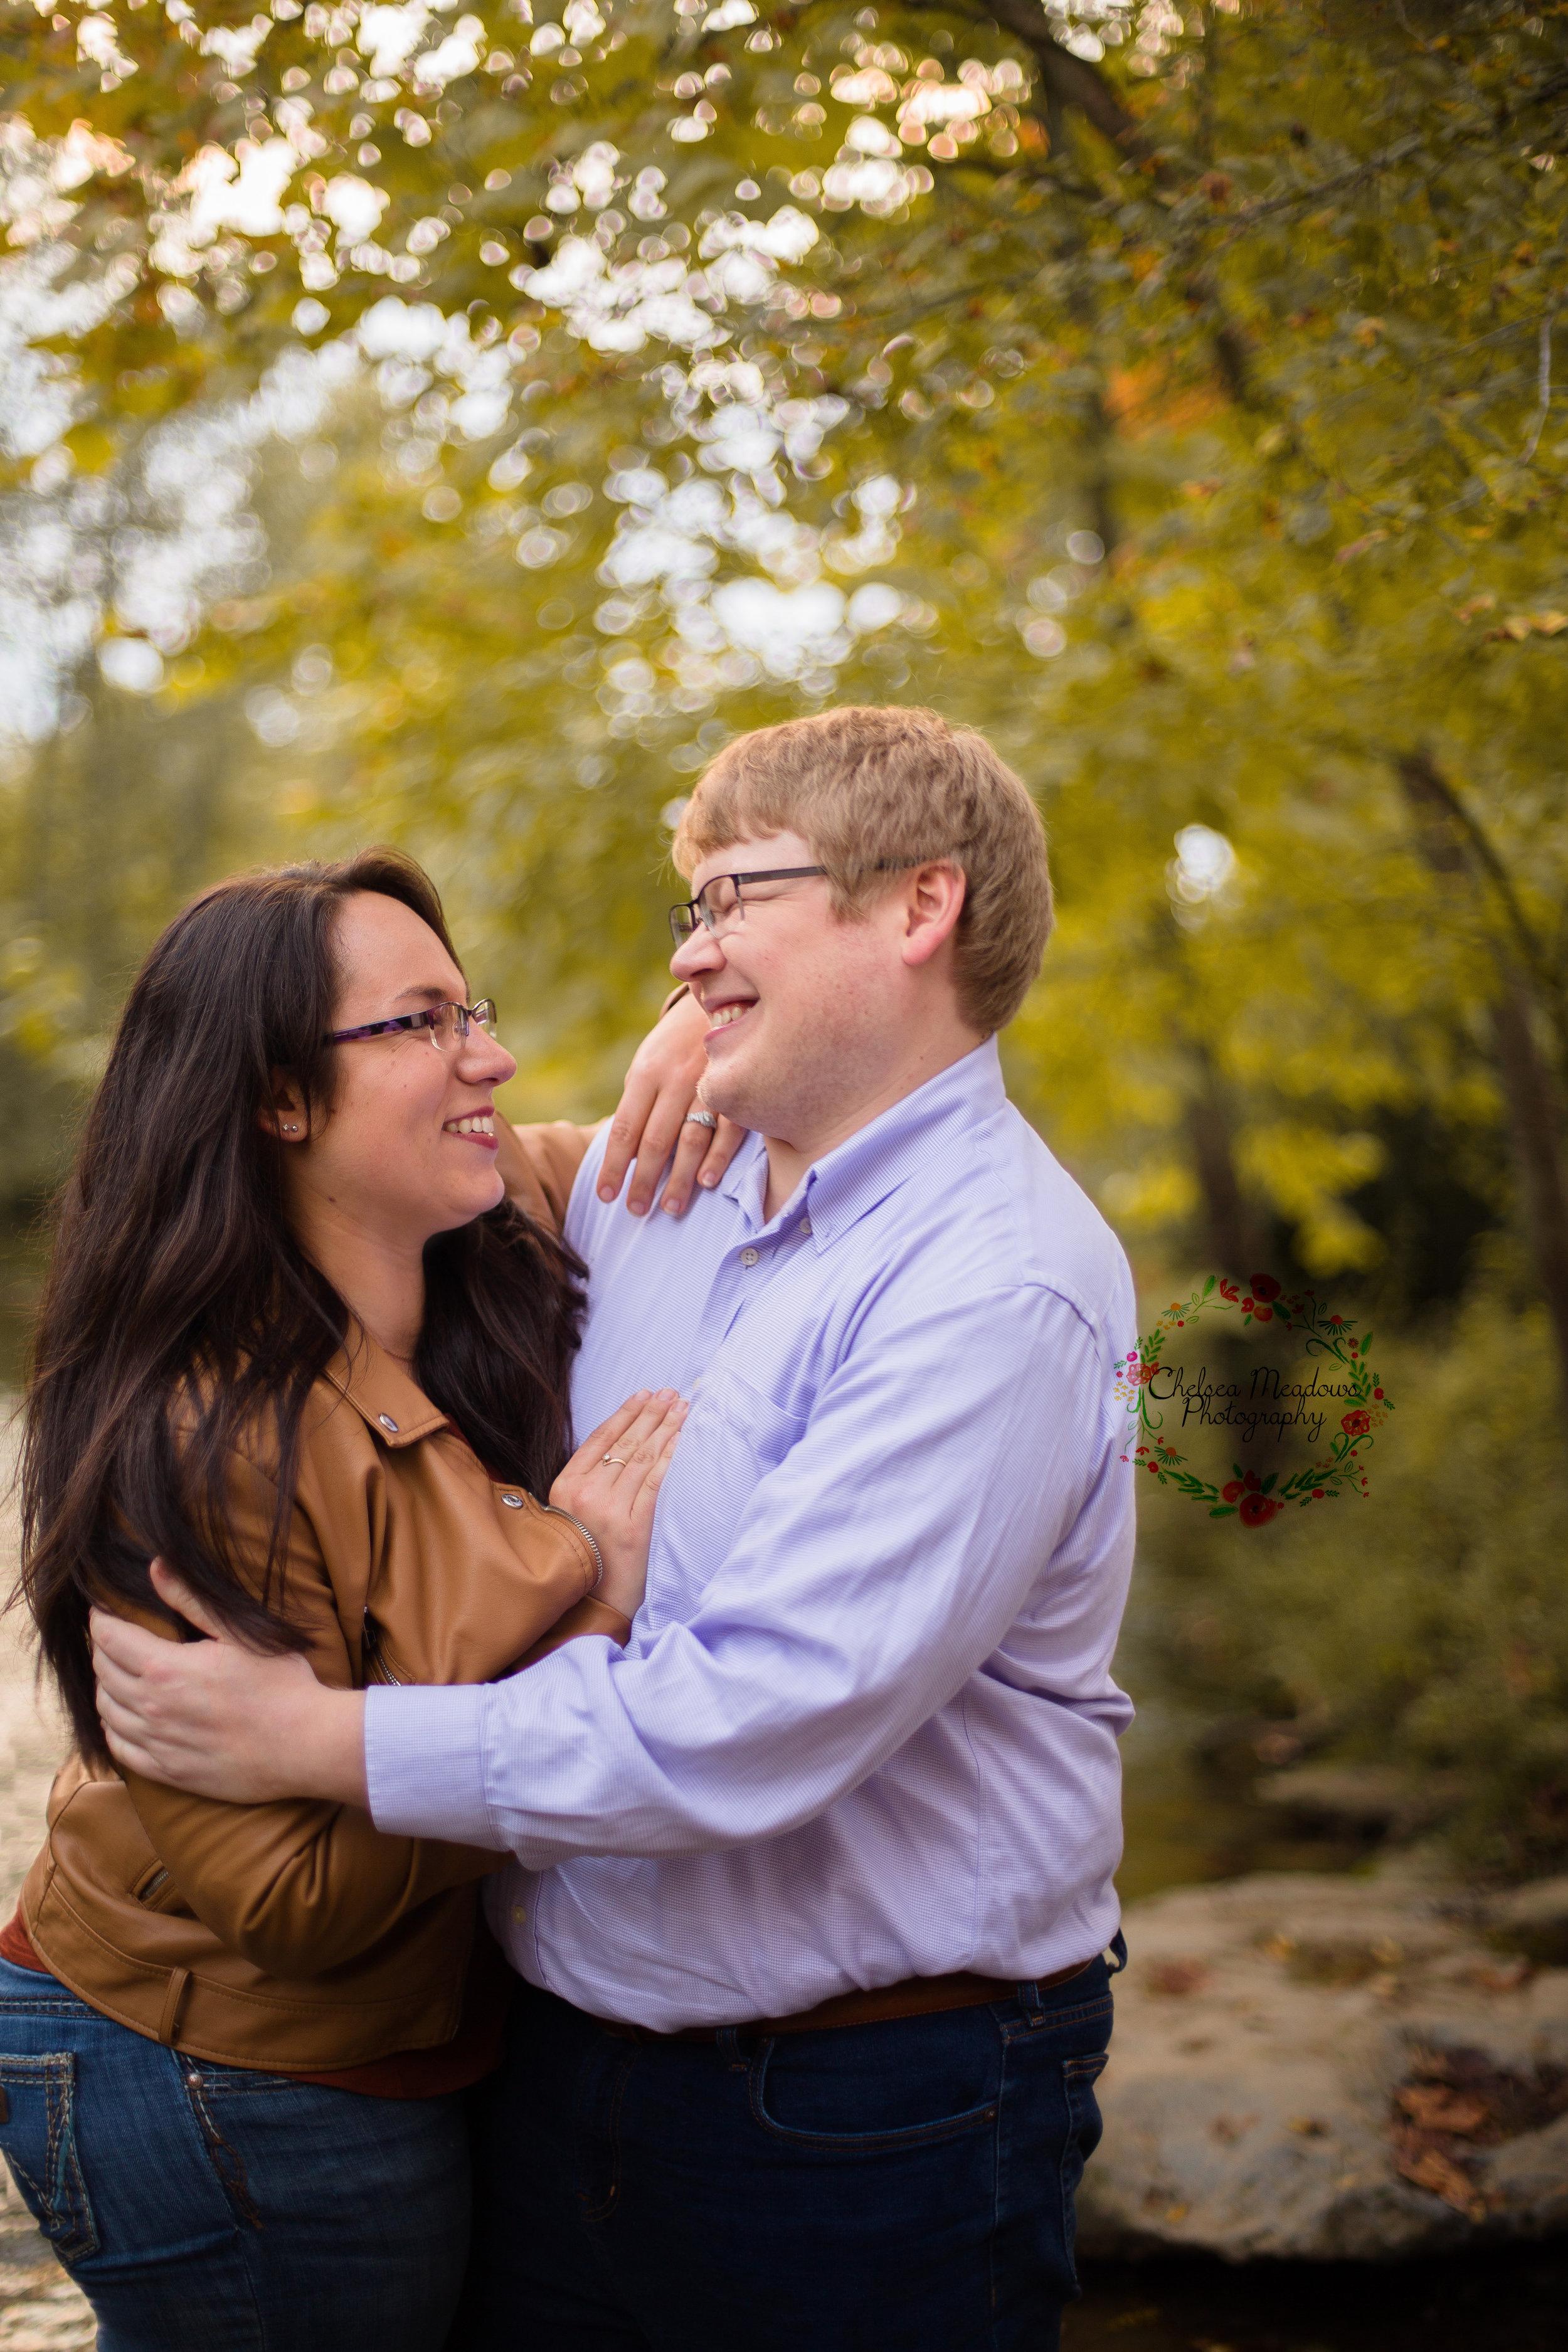 Ashley & Alex Engagement Session - Nashville Couple Photographer - Chelsea Meadows Photography (26).jpg